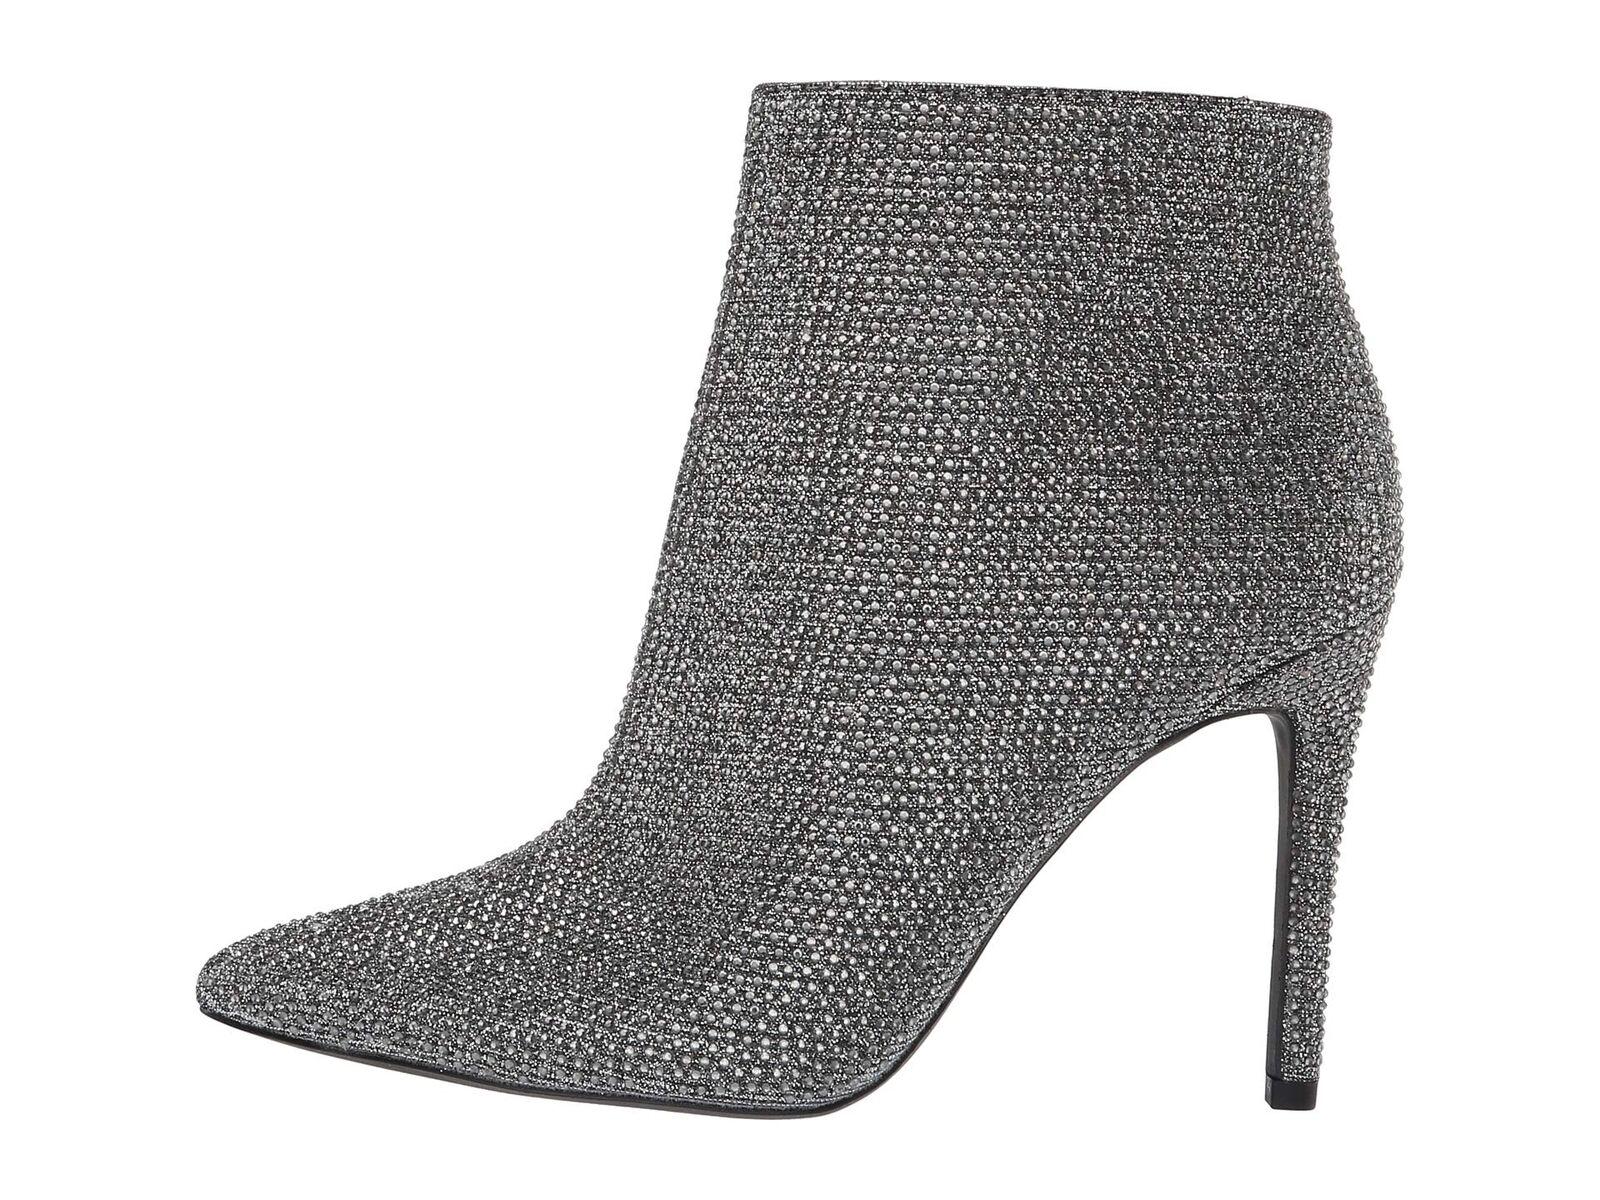 Jessica Simpson Mujer Pelina 3 3 3 bota Estaño Multi  hasta un 65% de descuento